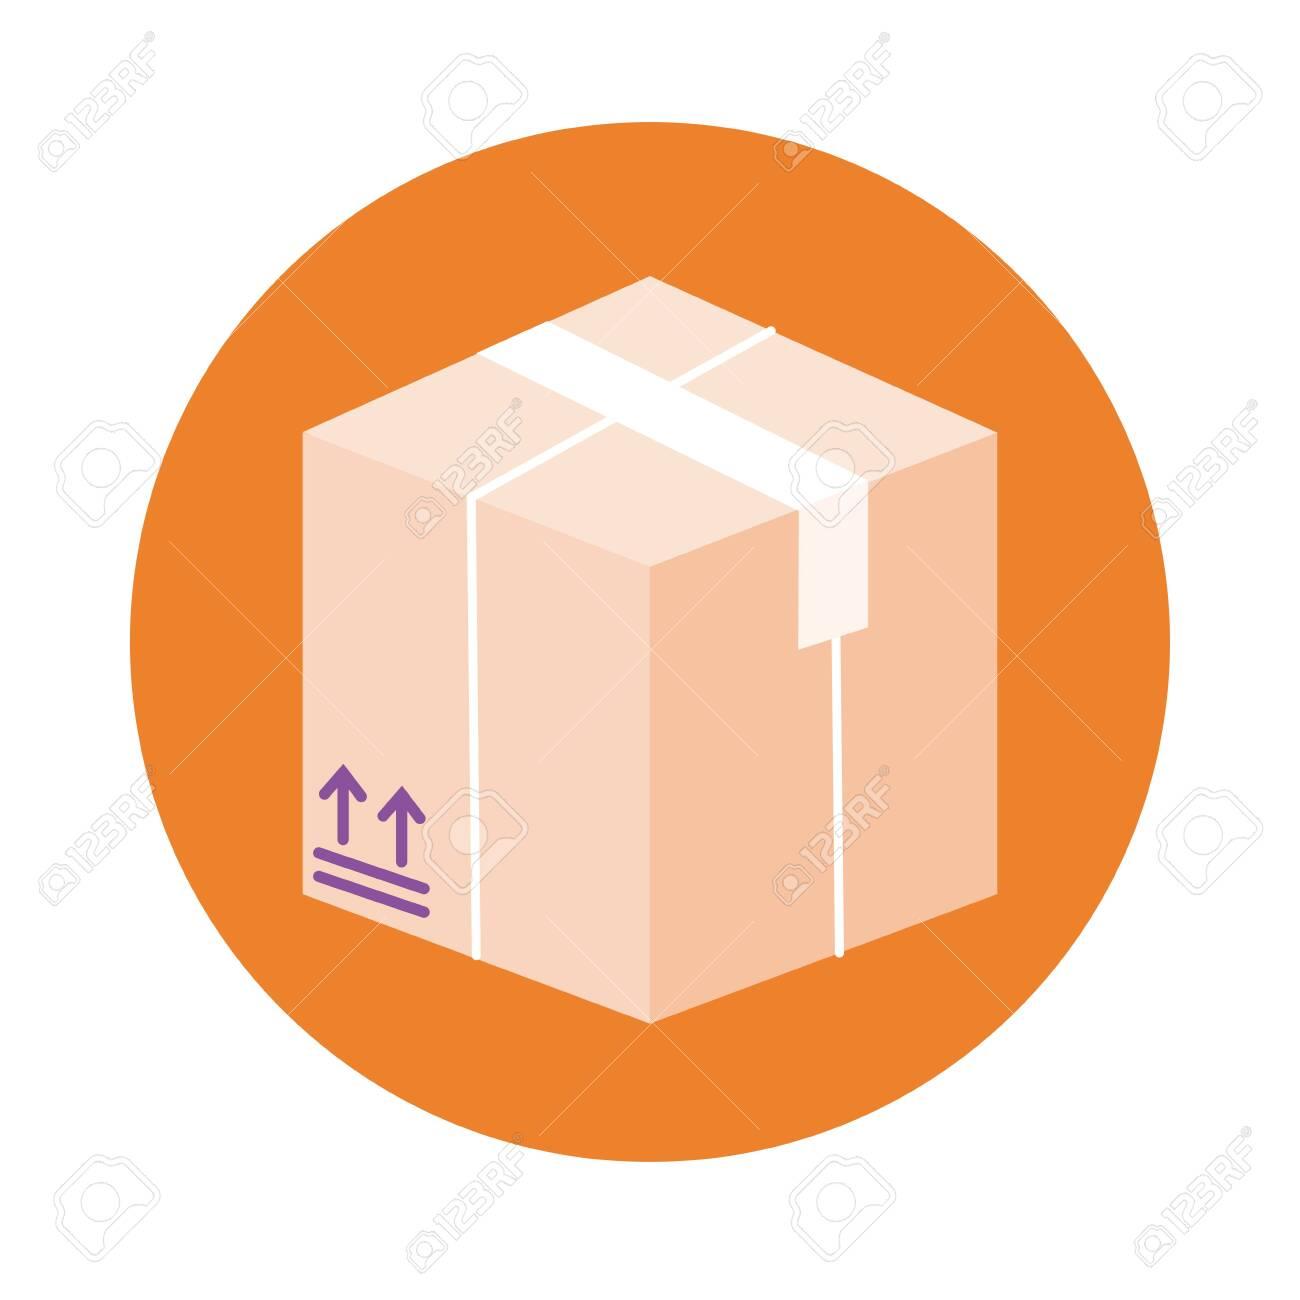 box delivery service block style vector illustration design - 155529778